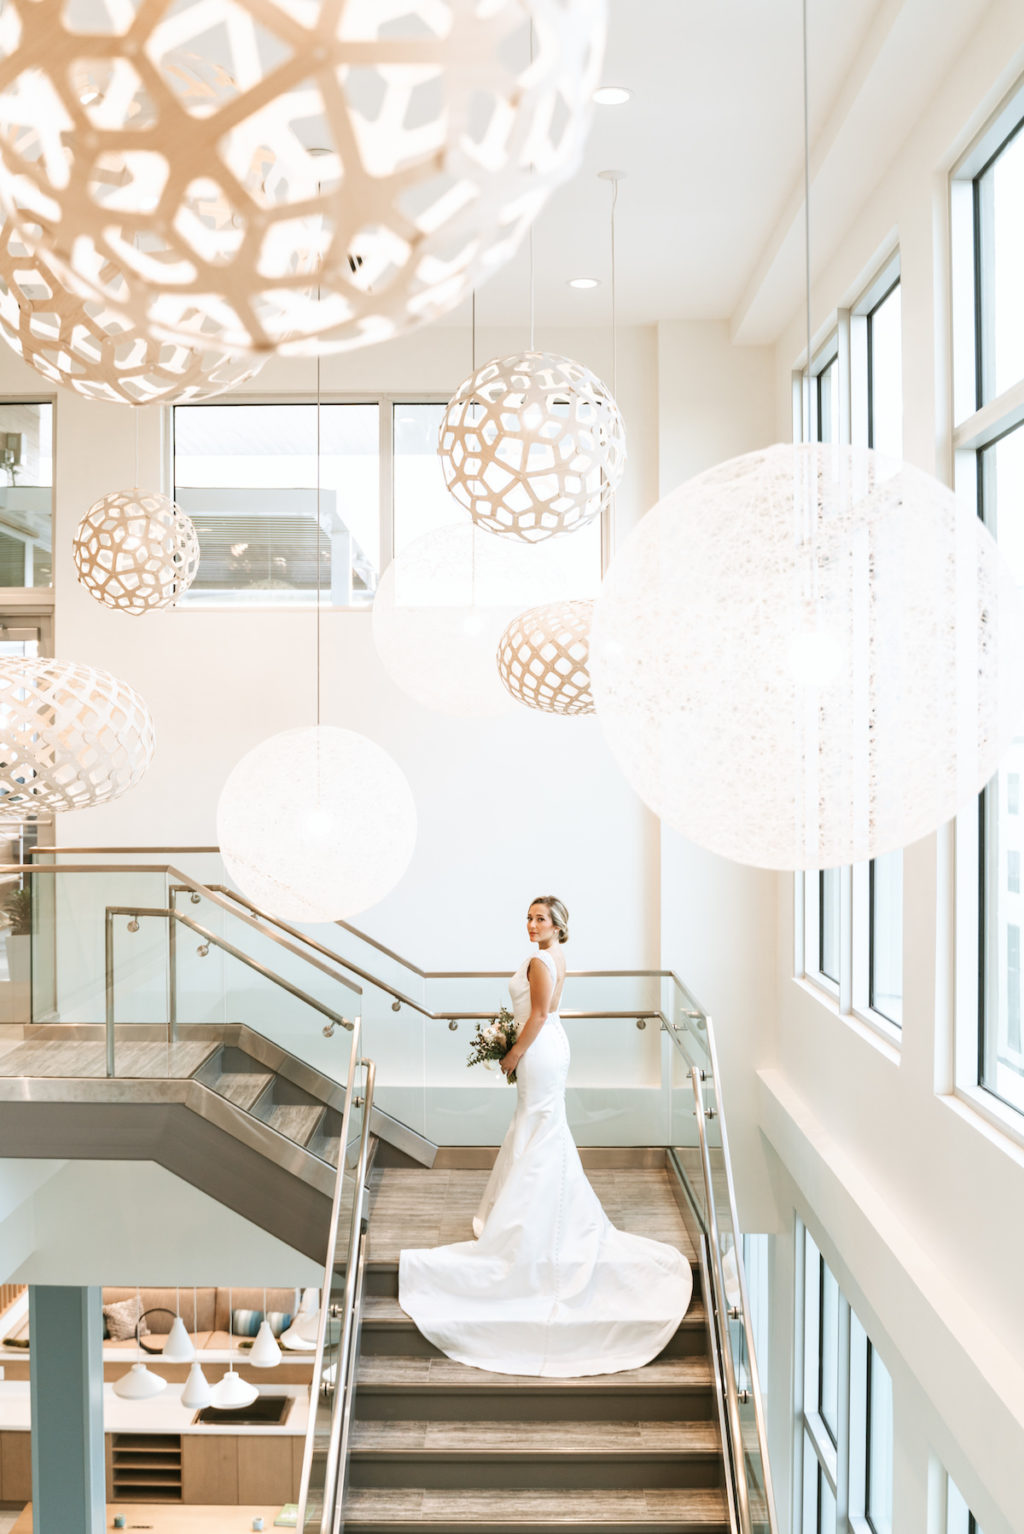 Bridal Wedding Portrait on Staircase | Modern South Tampa Wedding Venue Aloft | Wedding Photographer and Videographer Bonnie Newman Creative | Wedding Dress Truly Forever Bridal